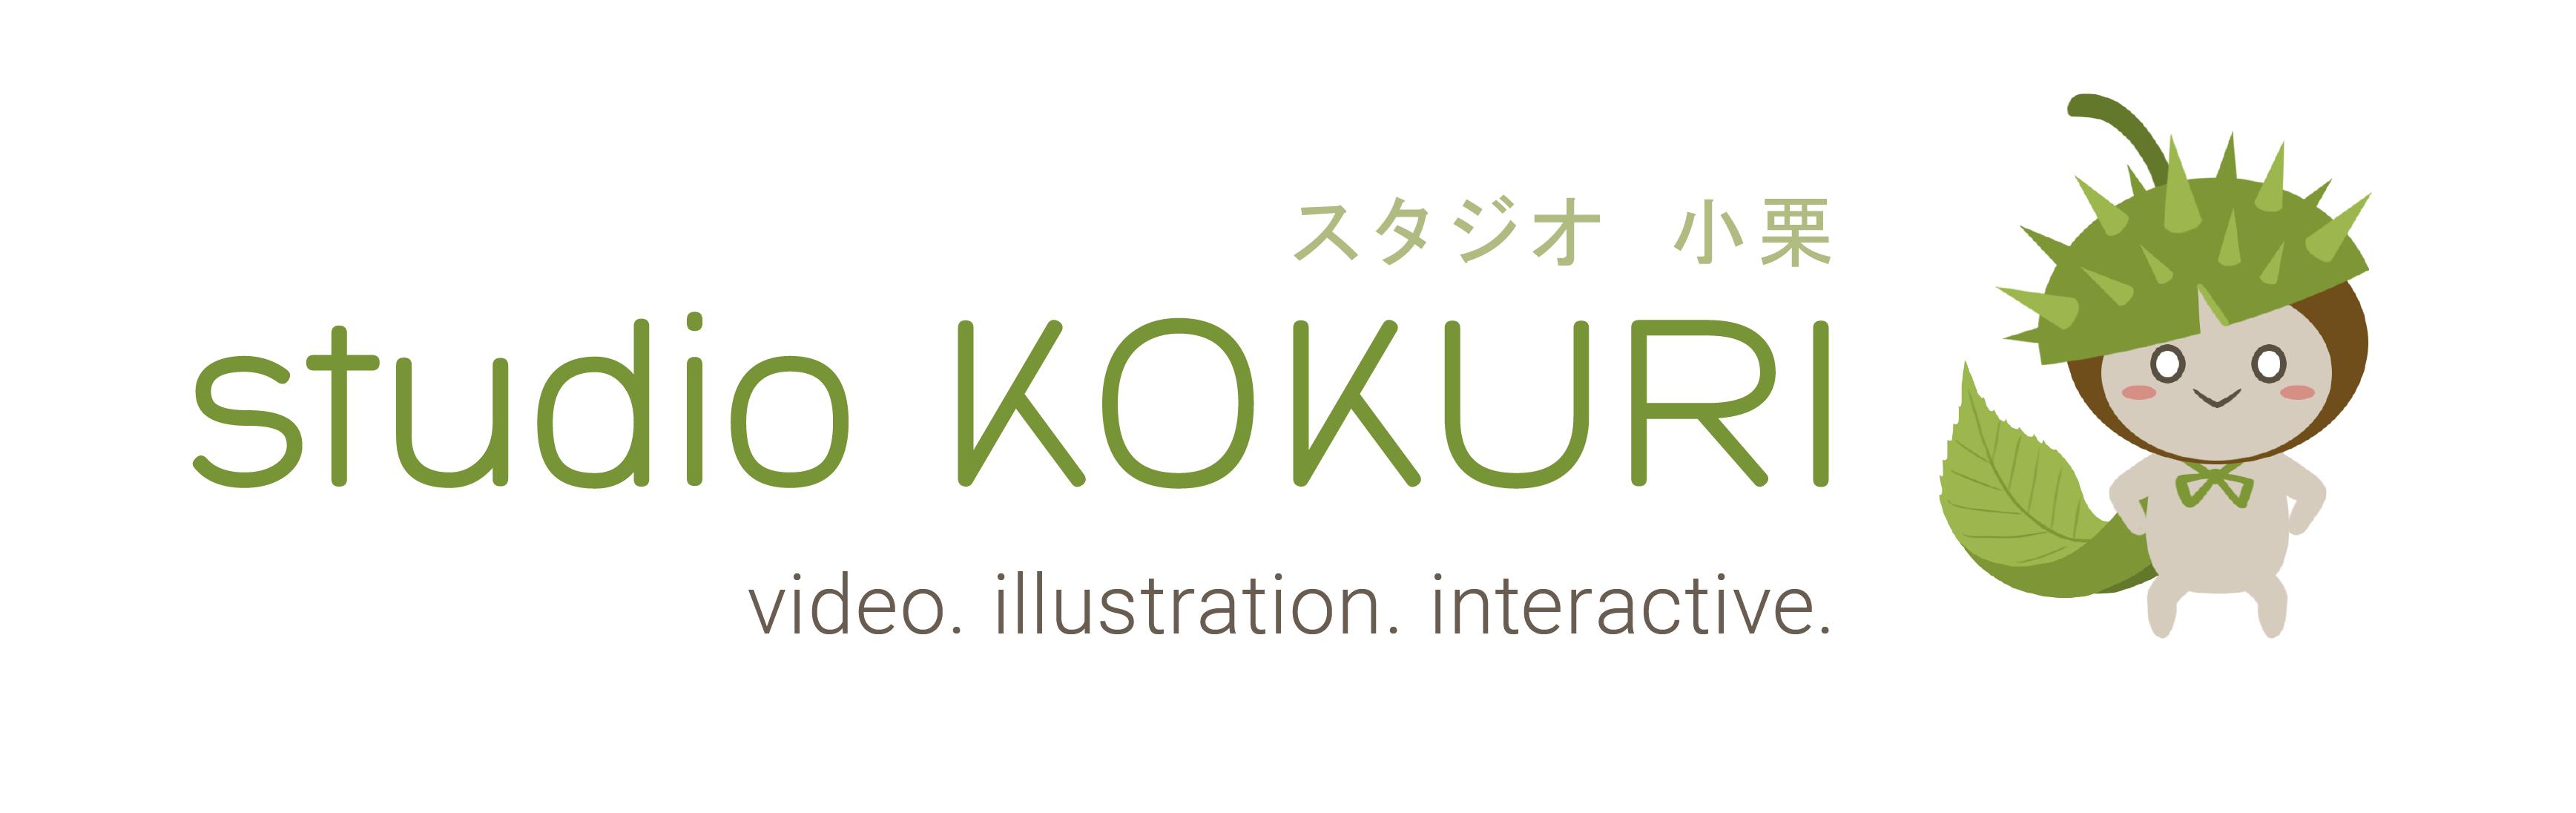 studio_kokuri_LOGO_pv_02_white